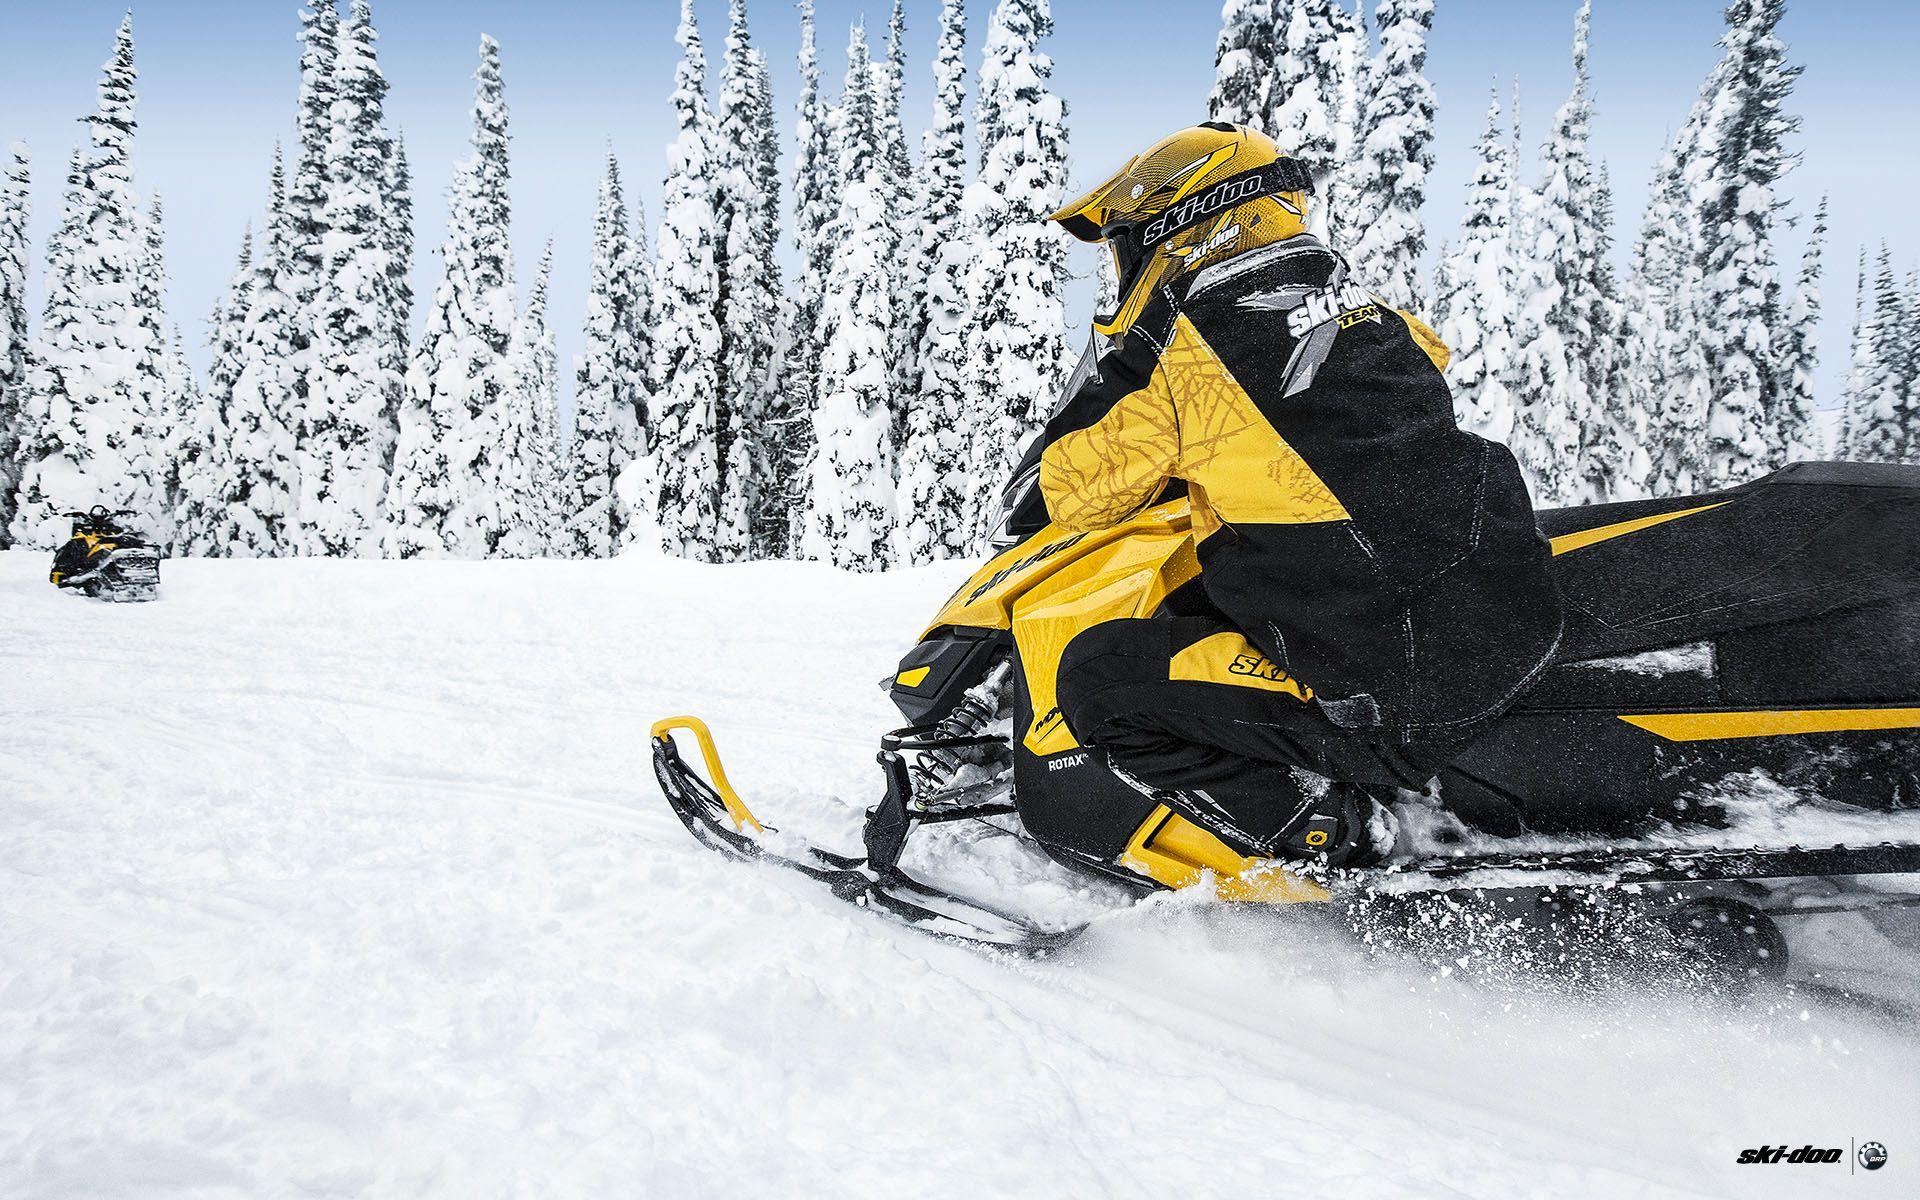 SKI DOO MXZ Turbo Sno Pro snowmobile winter ski doo e wallpaper 1920x1200